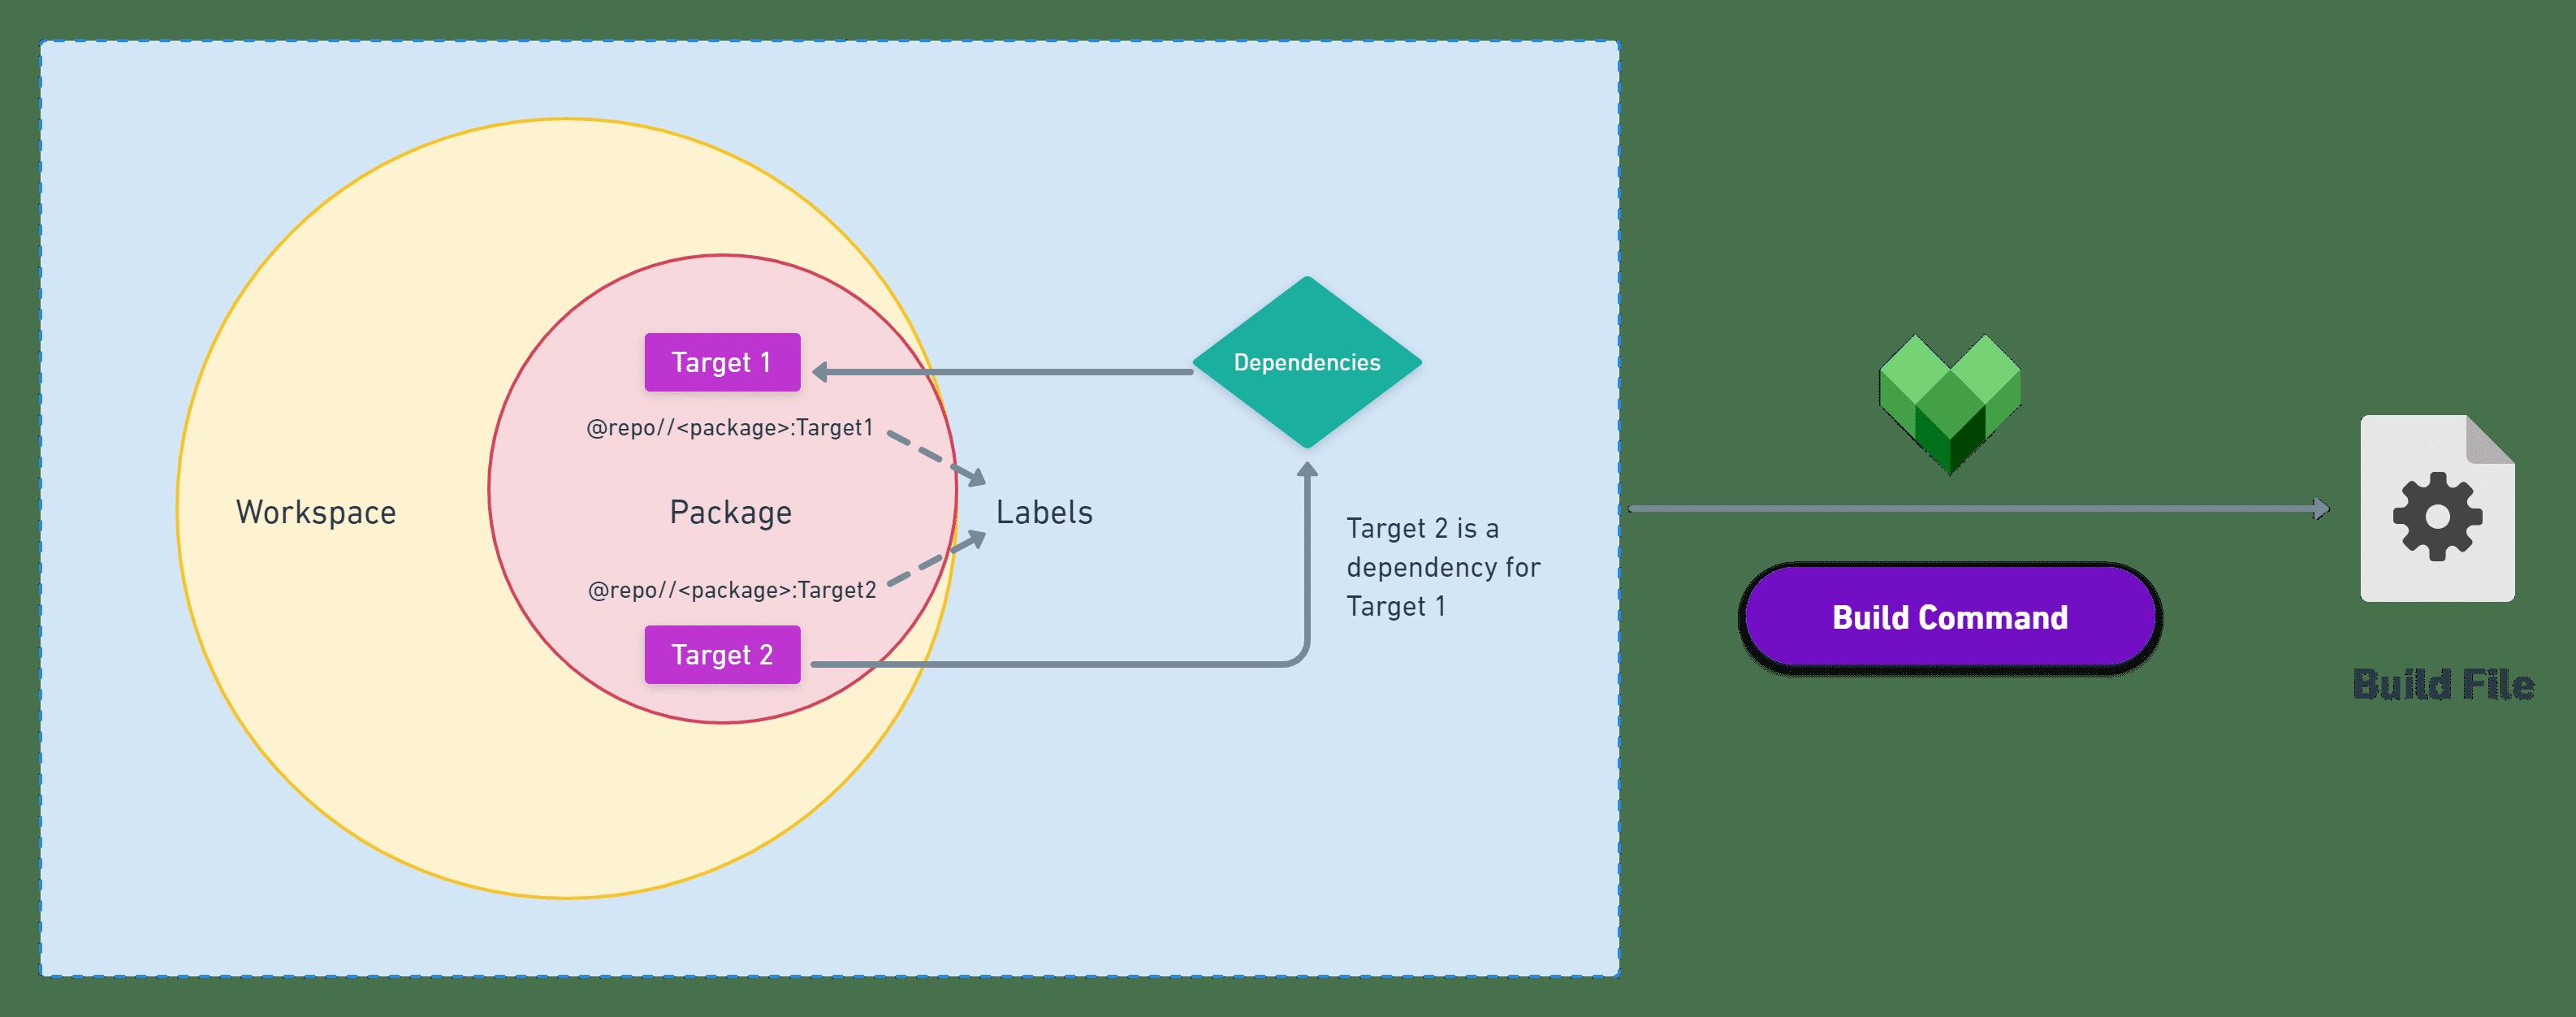 Bazel Terminologies in a Build Workflow